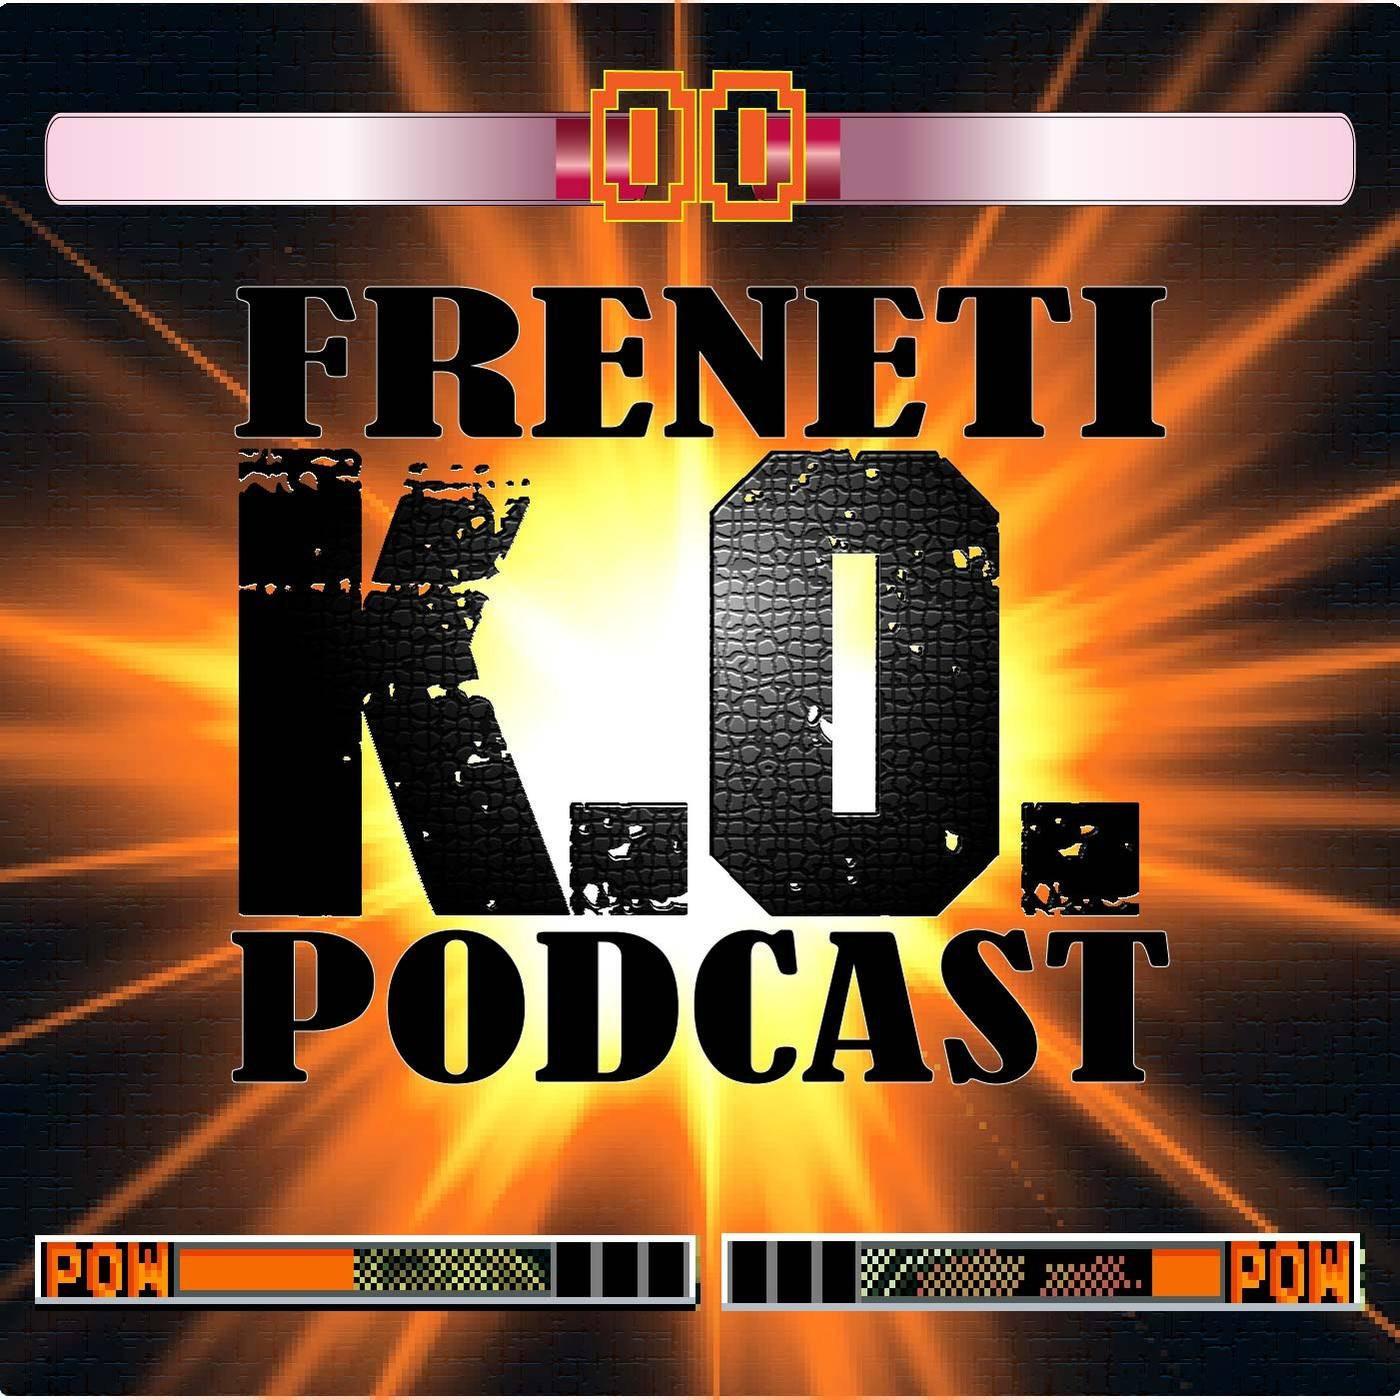 <![CDATA[Frenétiko Podcast]]>